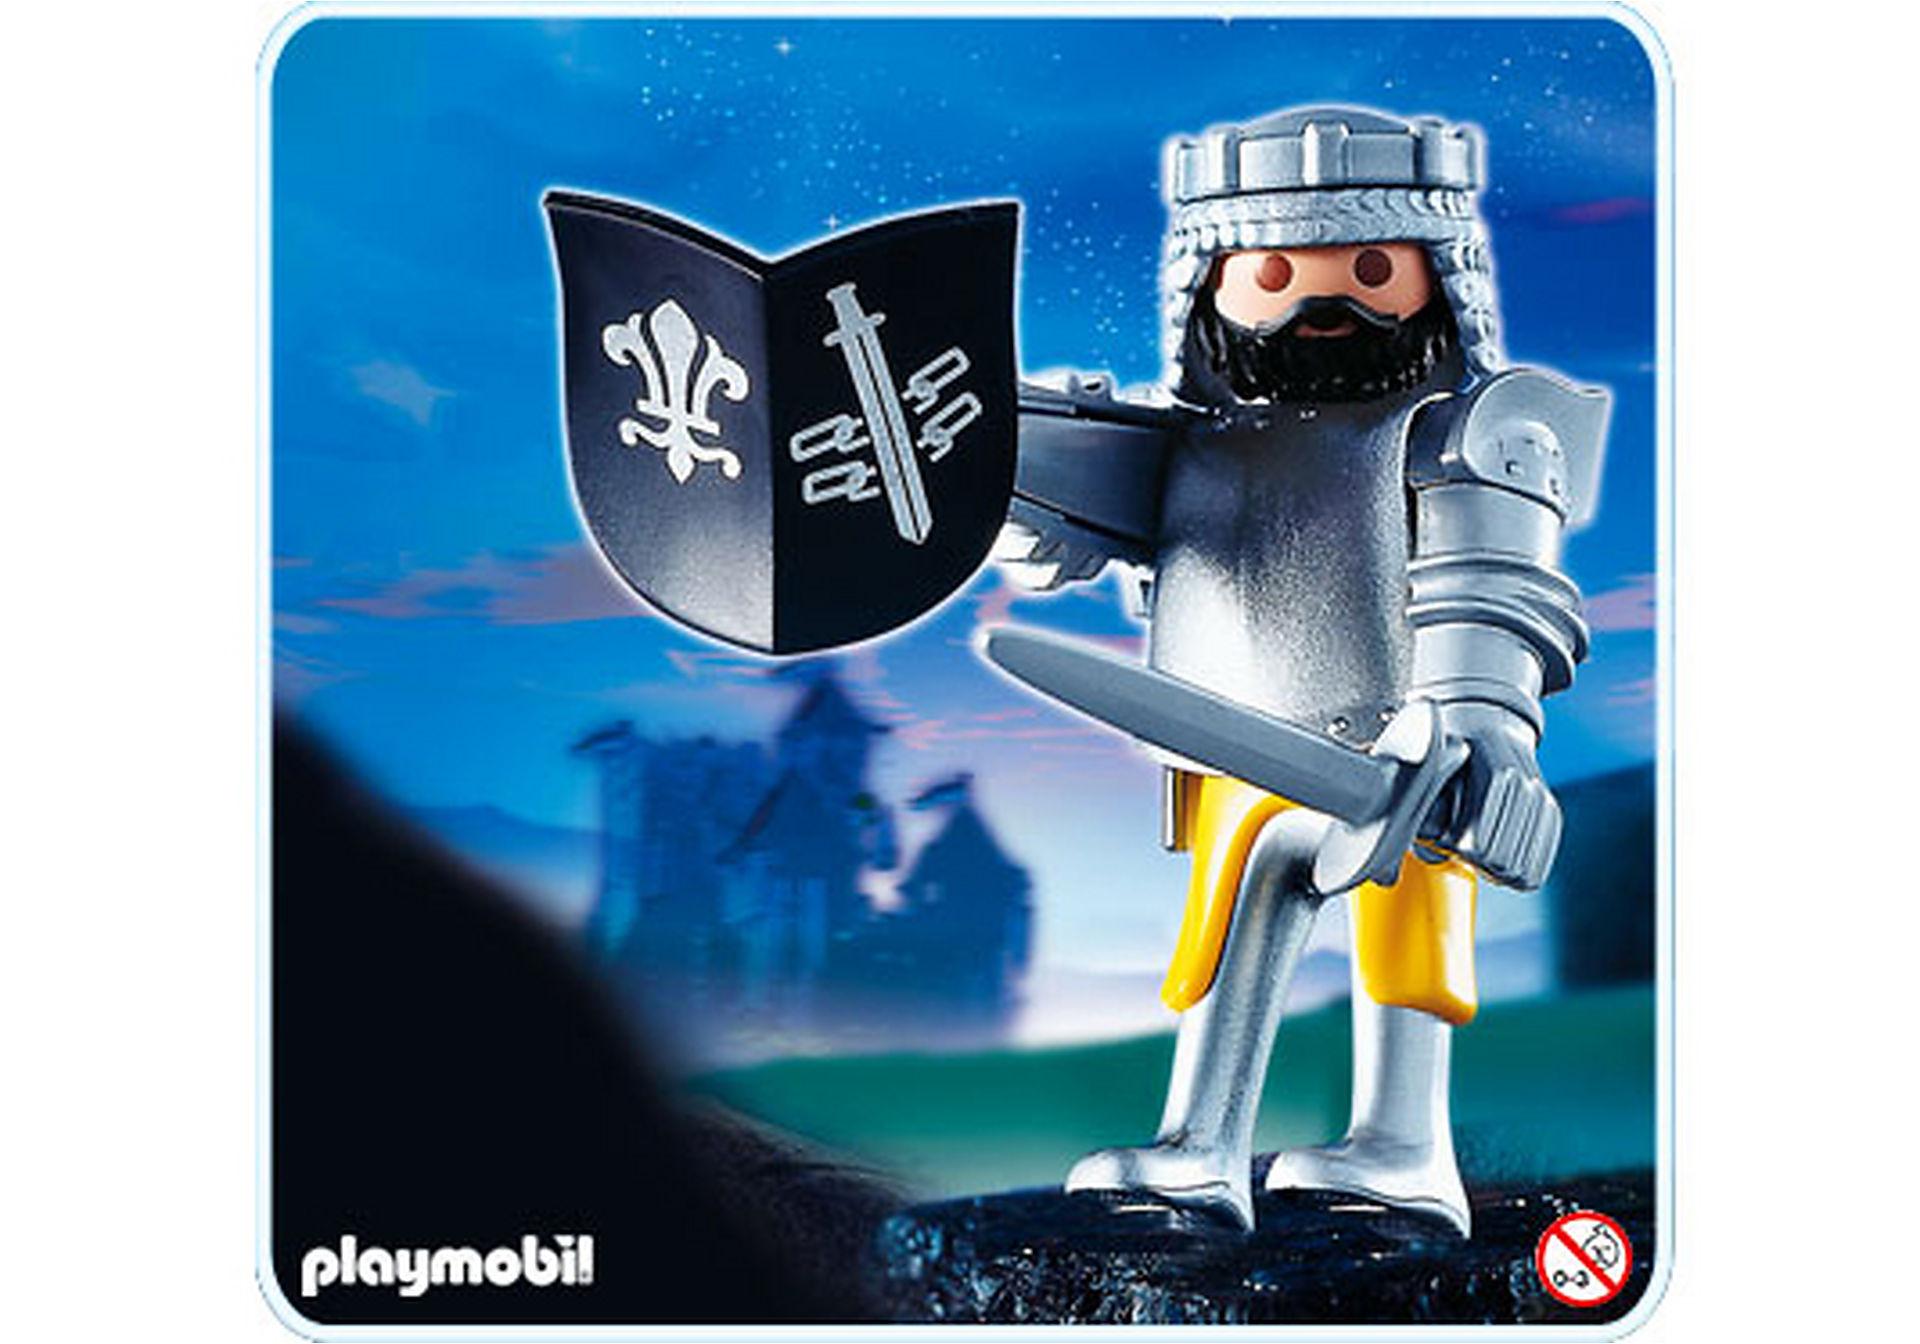 http://media.playmobil.com/i/playmobil/4666-A_product_detail/Seigneur / armure